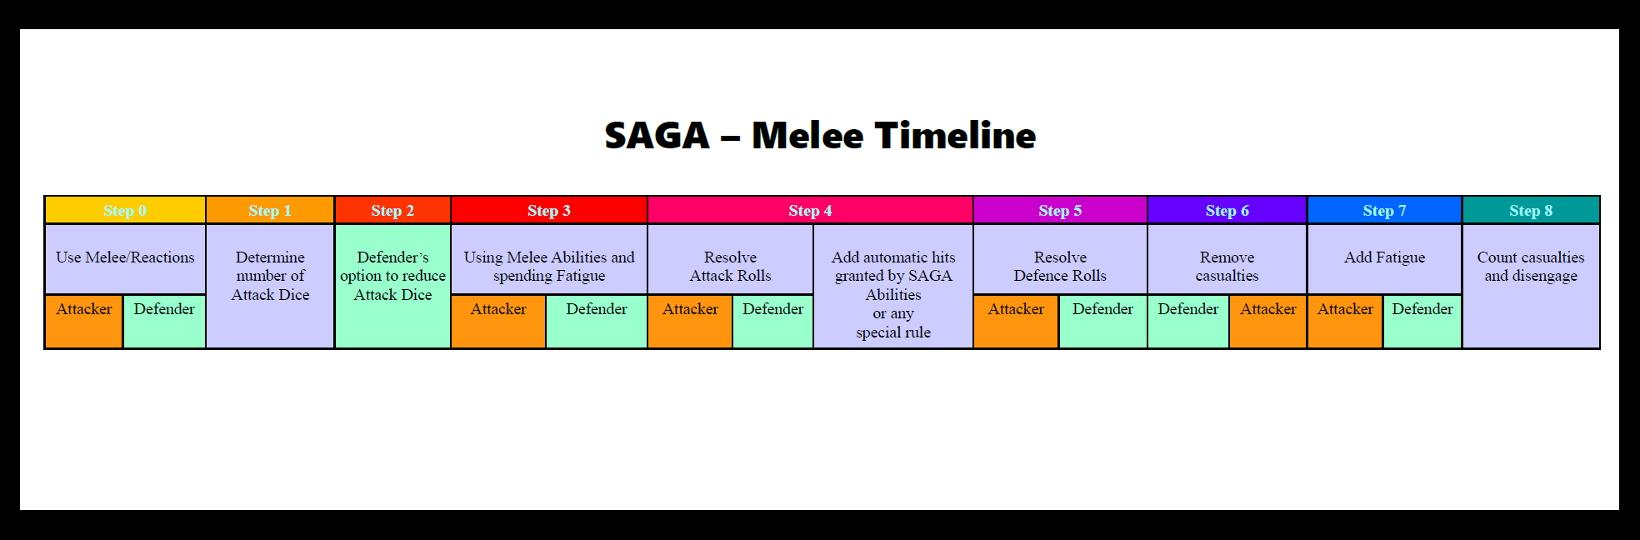 saga-melee-timeline.jpg.6d18a663fd78a7a471837393e170da07.jpg